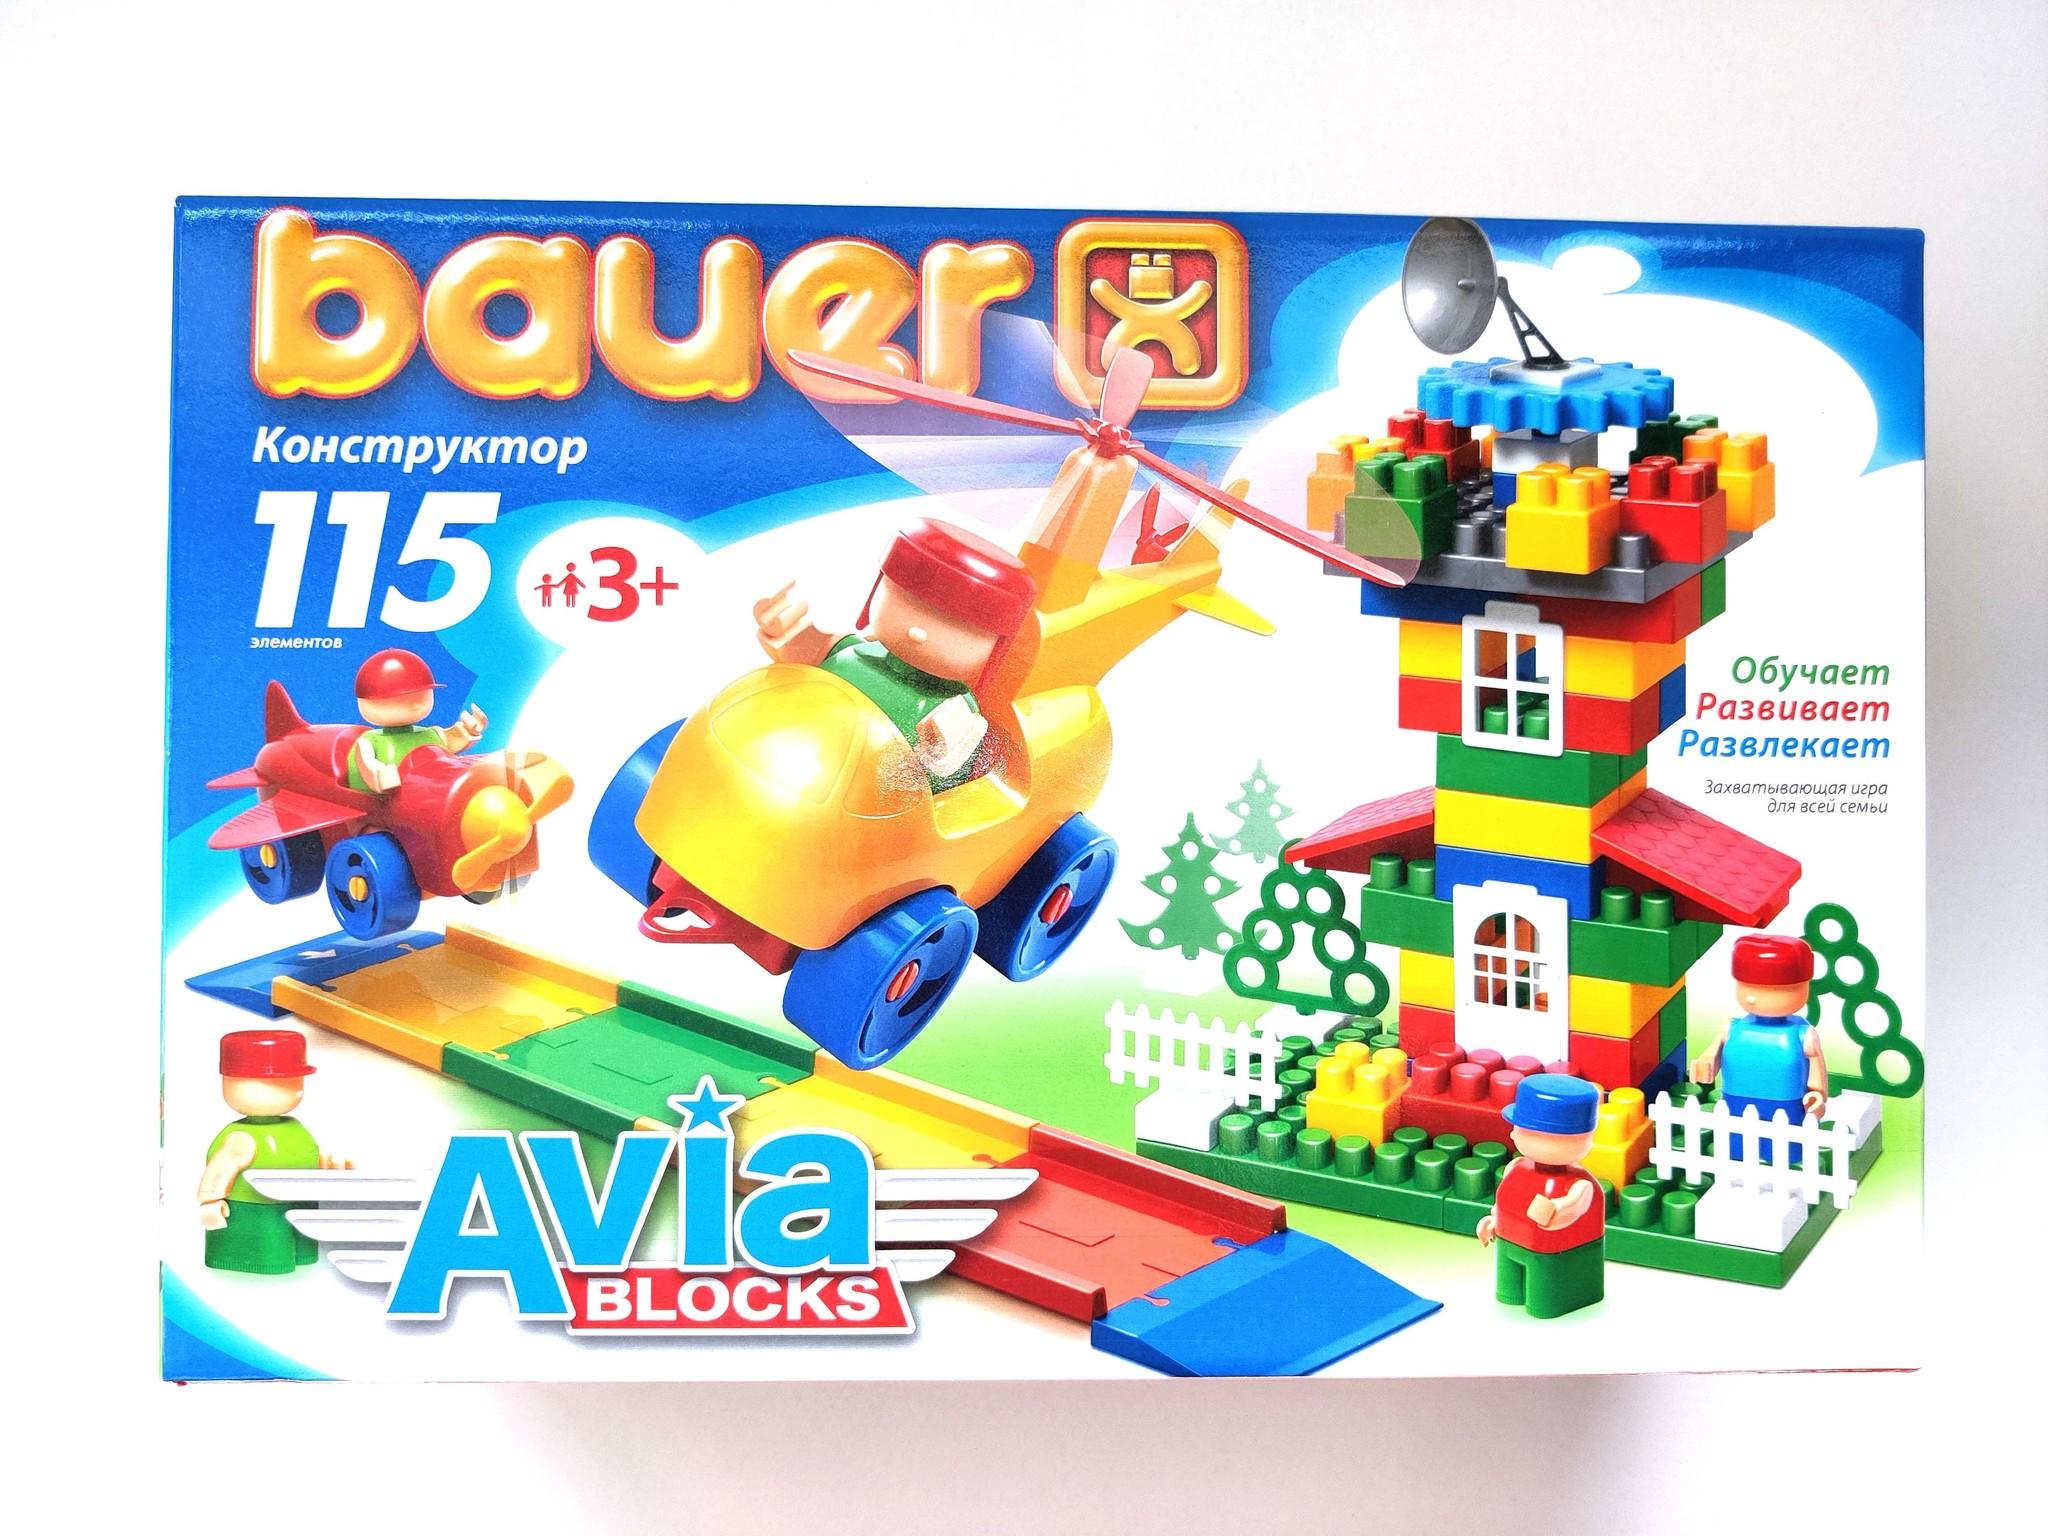 Blokken Bauer-1